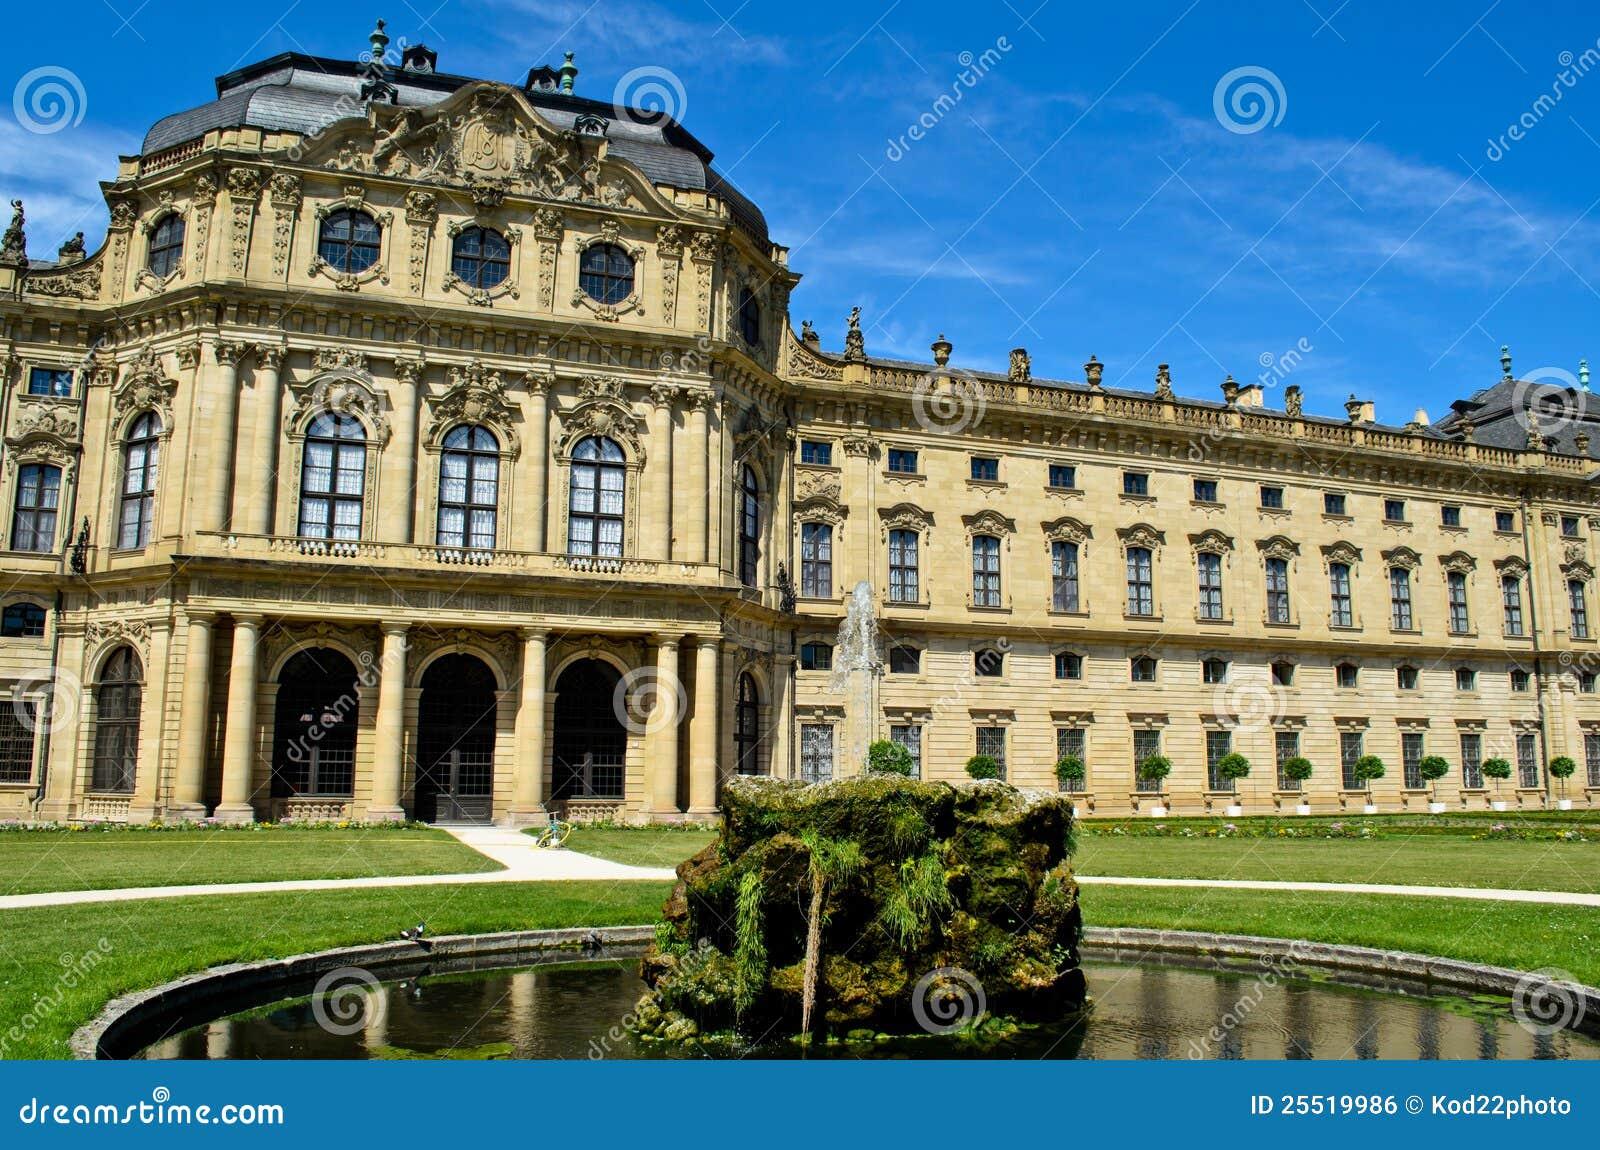 Wurzburg residence in germany royalty free stock image for Design hotel wurzburg